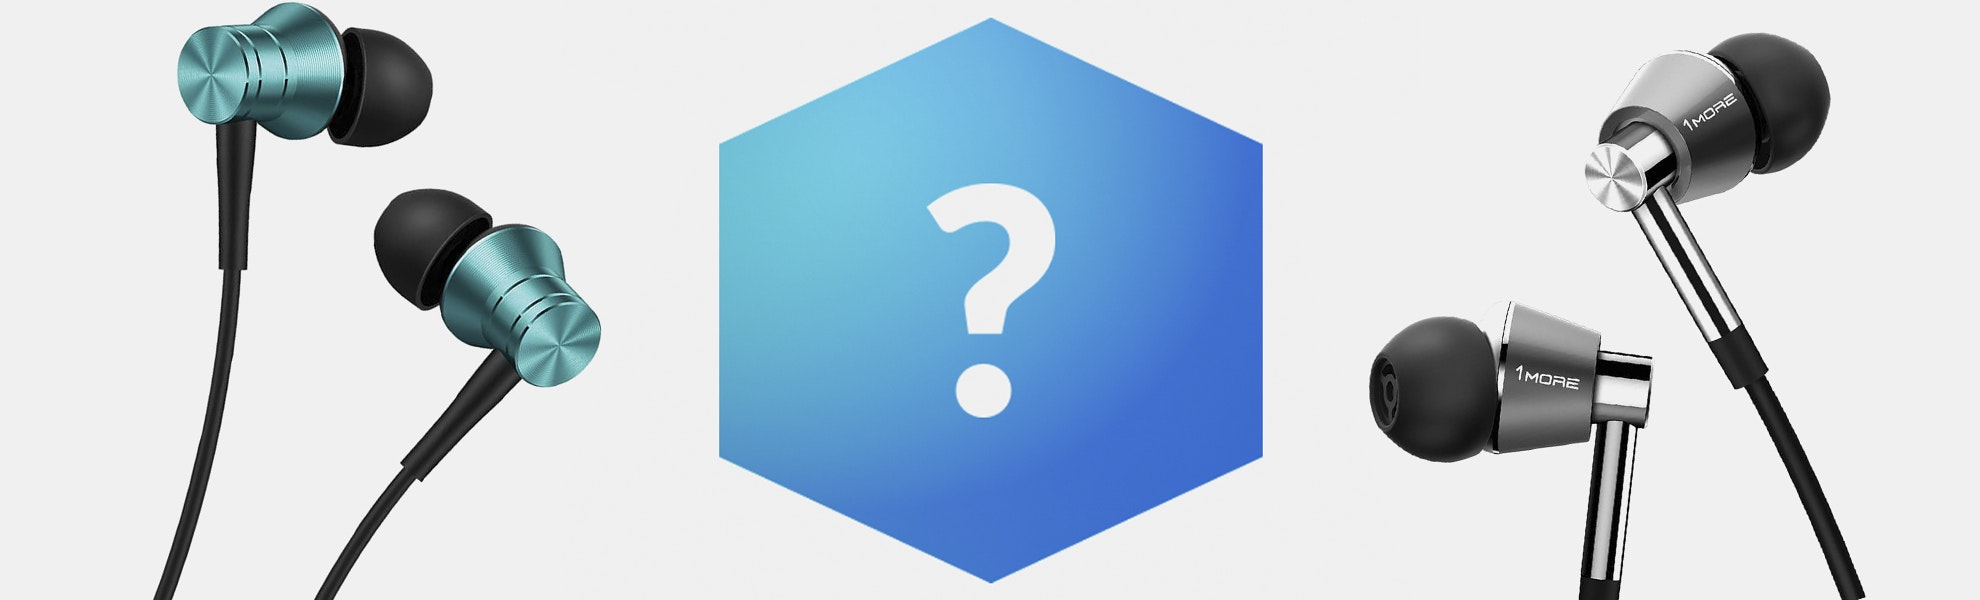 Massdrop Blue Box: 1MORE IEMs